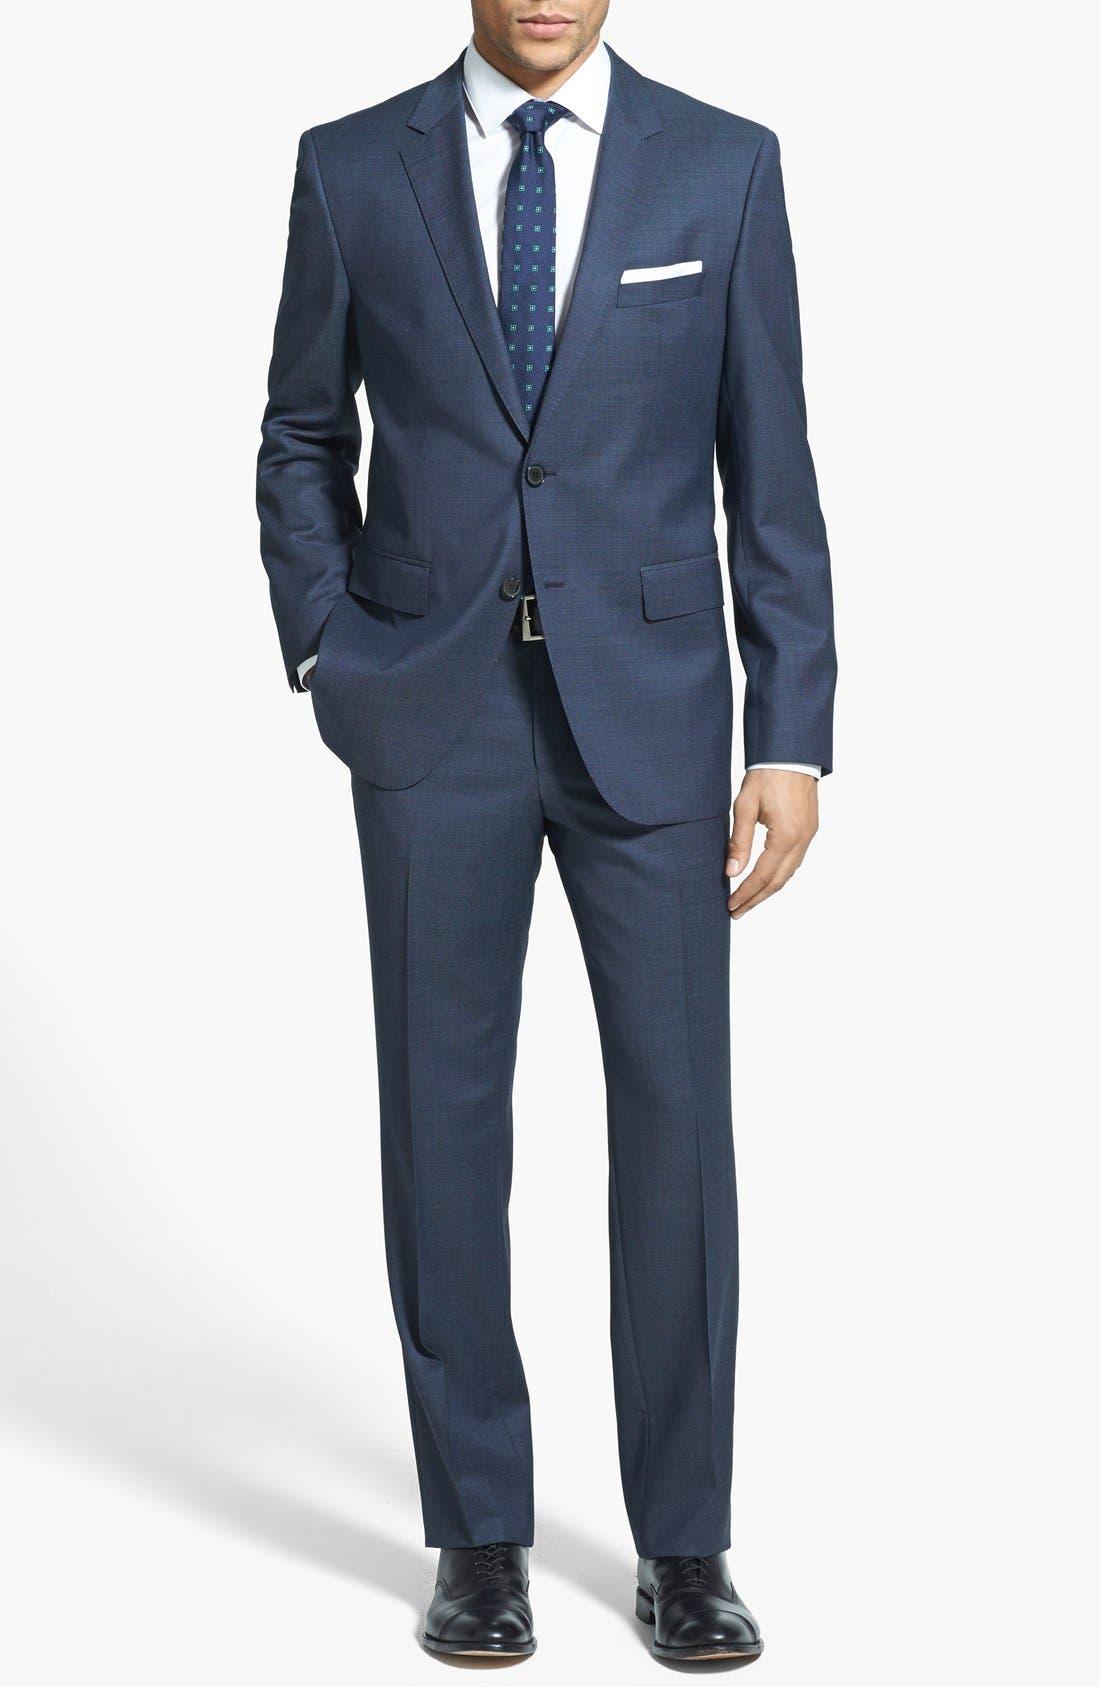 Main Image - BOSS HUGO BOSS 'James/Sharp' Trim Fit Wool Suit